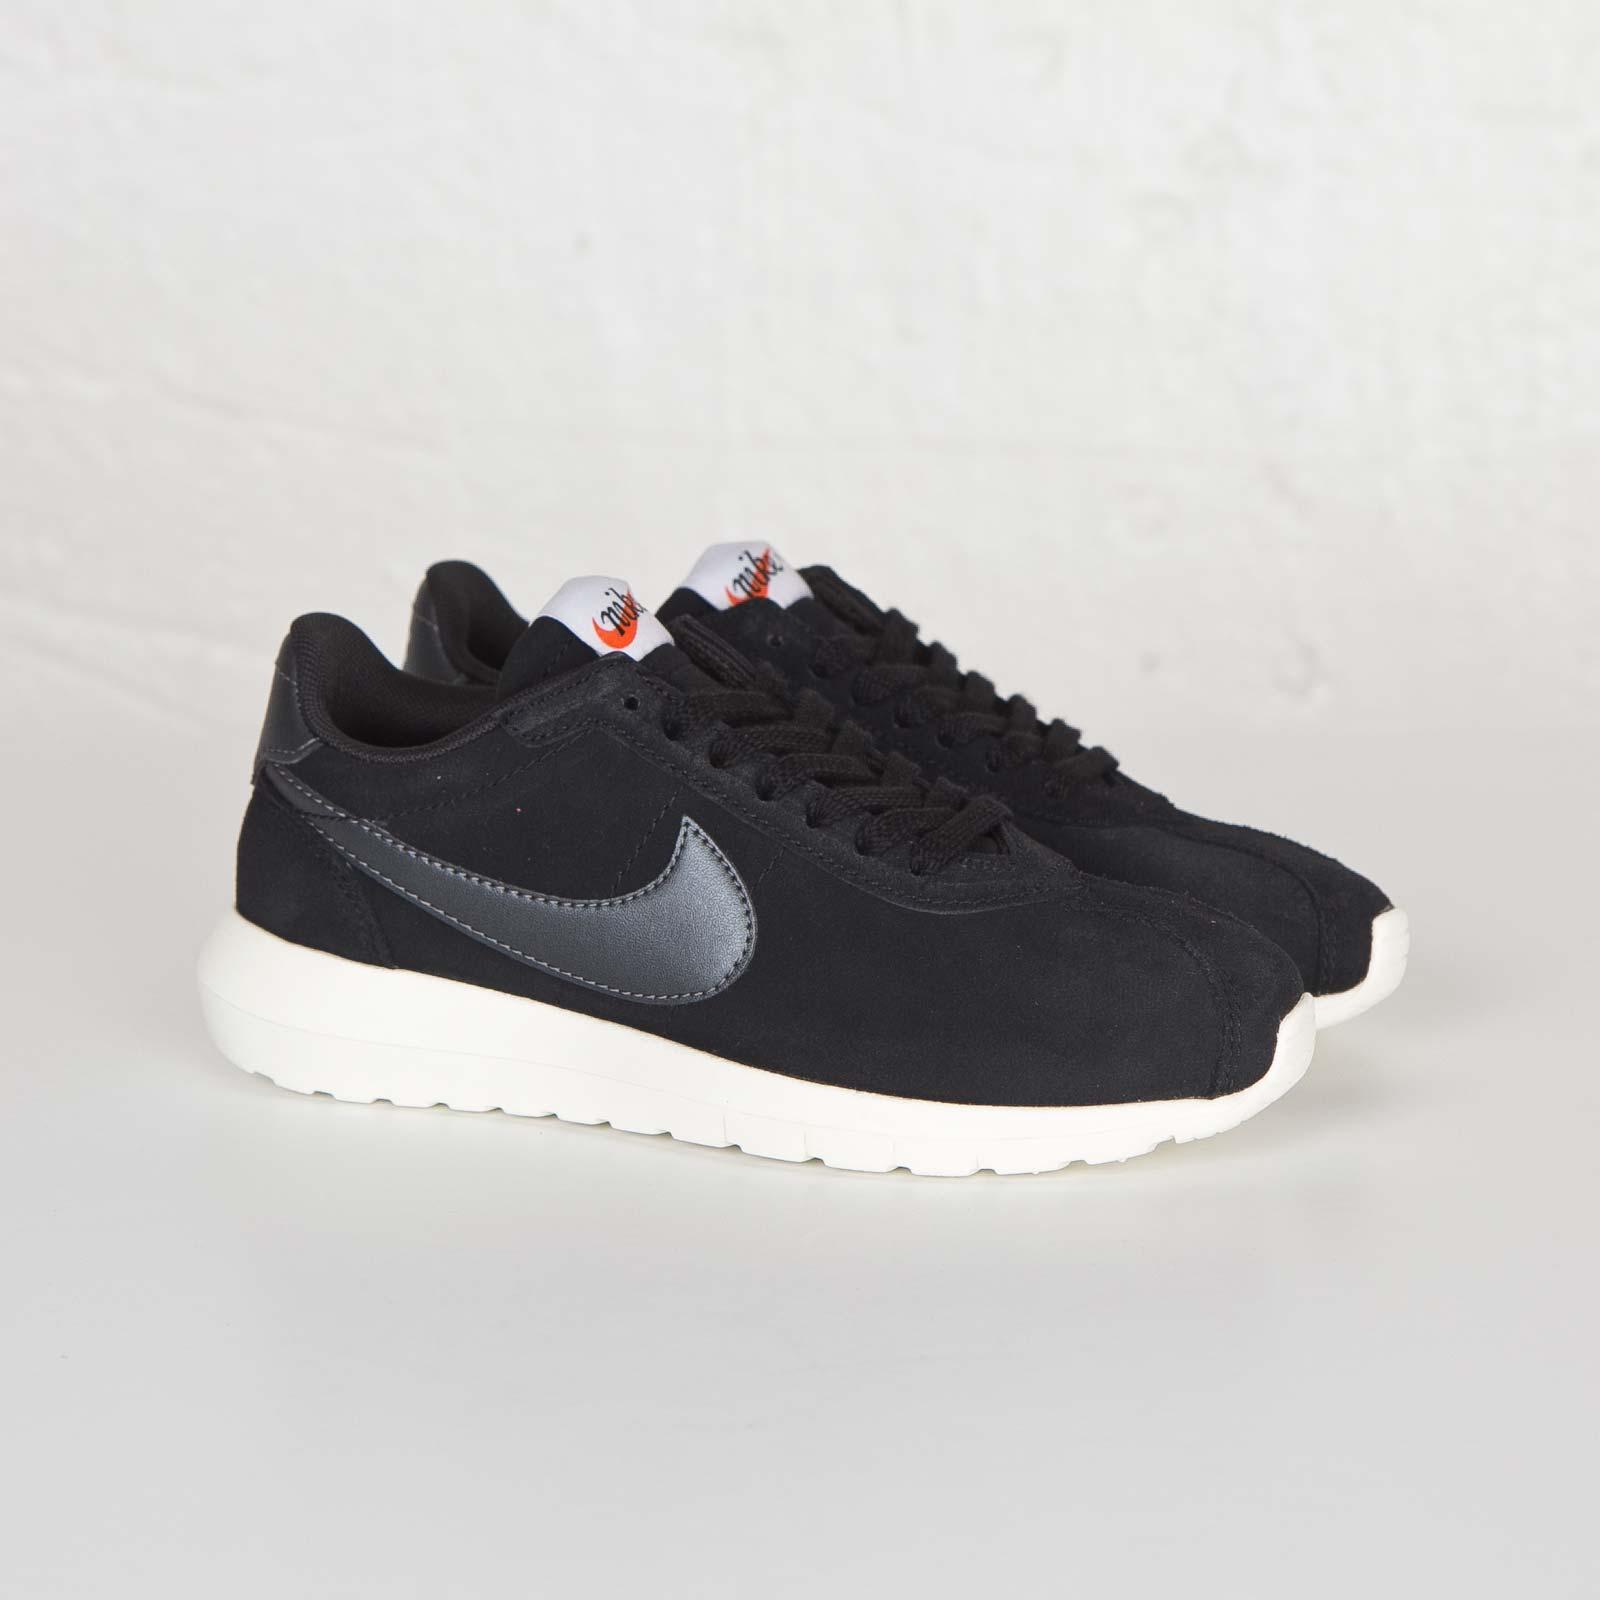 W ROSHE LD-1000 - FOOTWEAR - Low-tops & sneakers Nike njlWTKX70